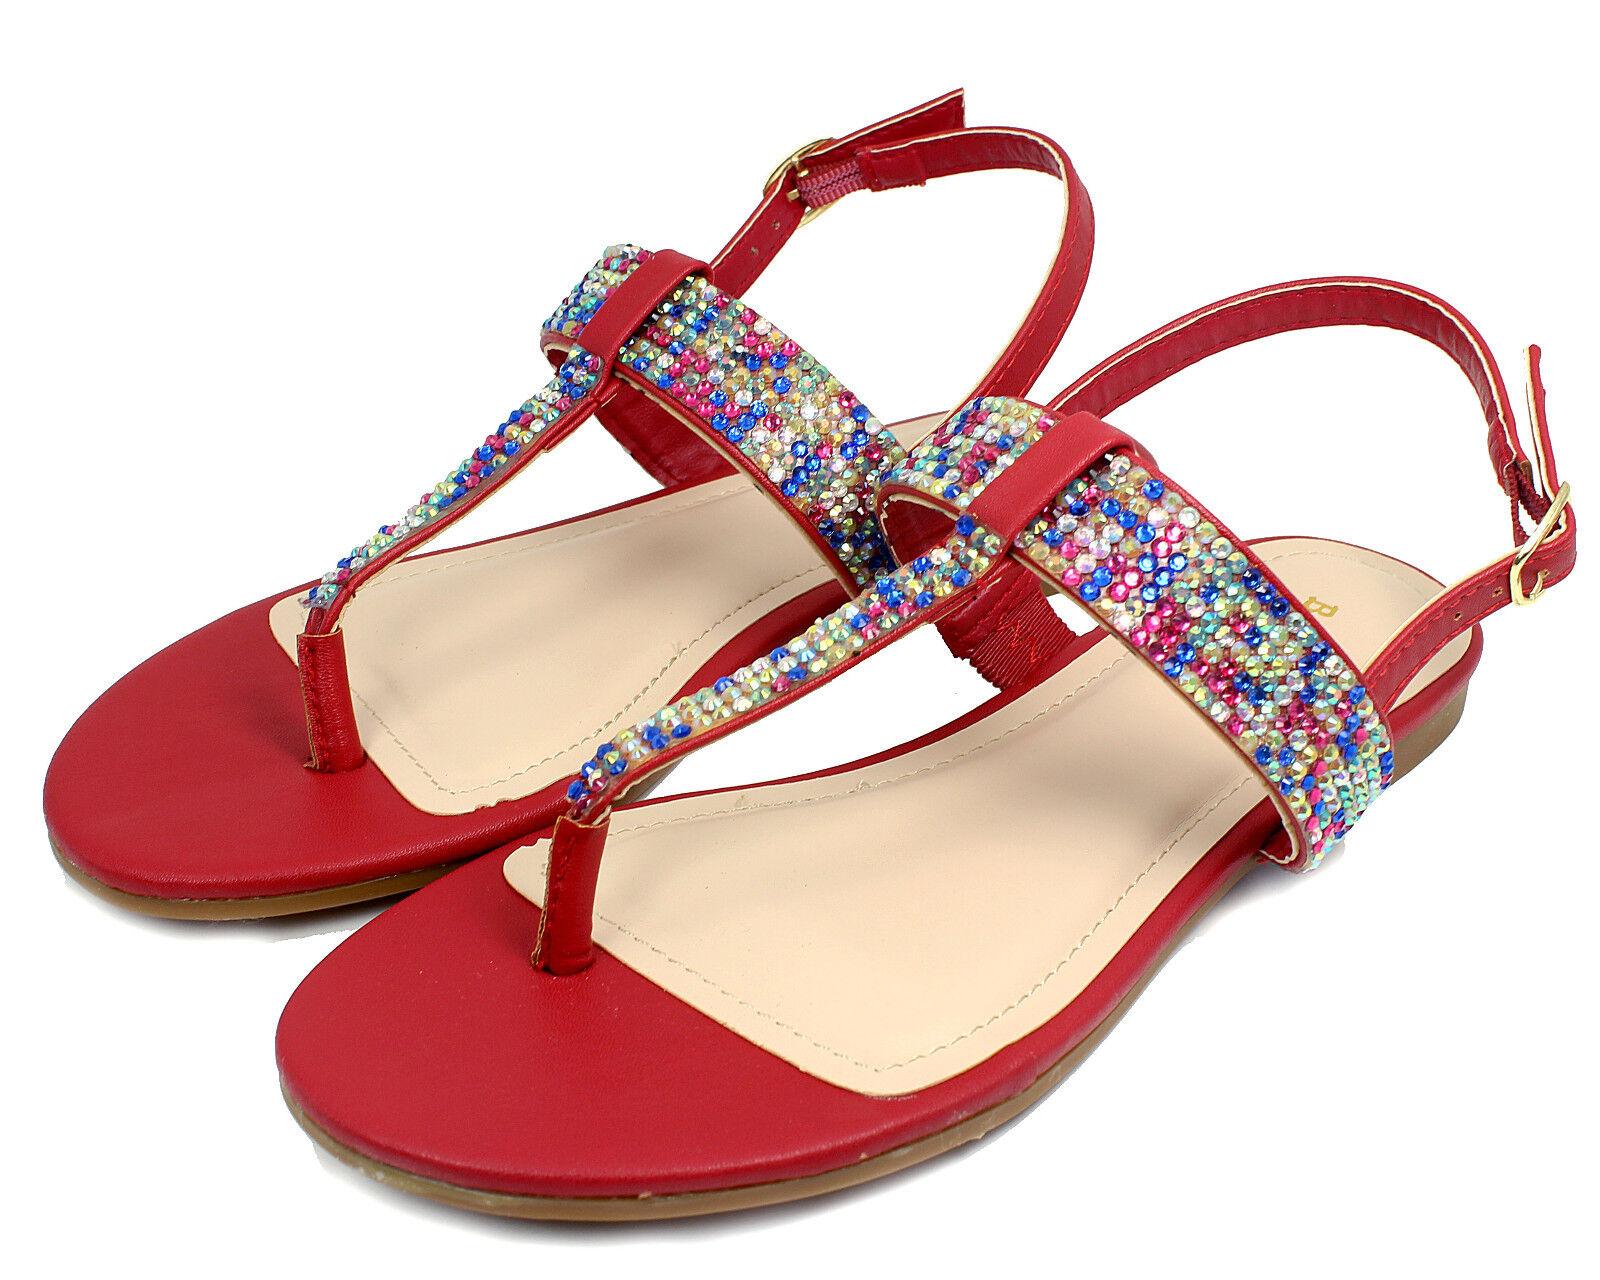 JOSALYN-22 T-Strap Women Thong Toe Gladiator Flats Sandals Bead Women T-Strap Shoes Red 6.5 b3ddd1